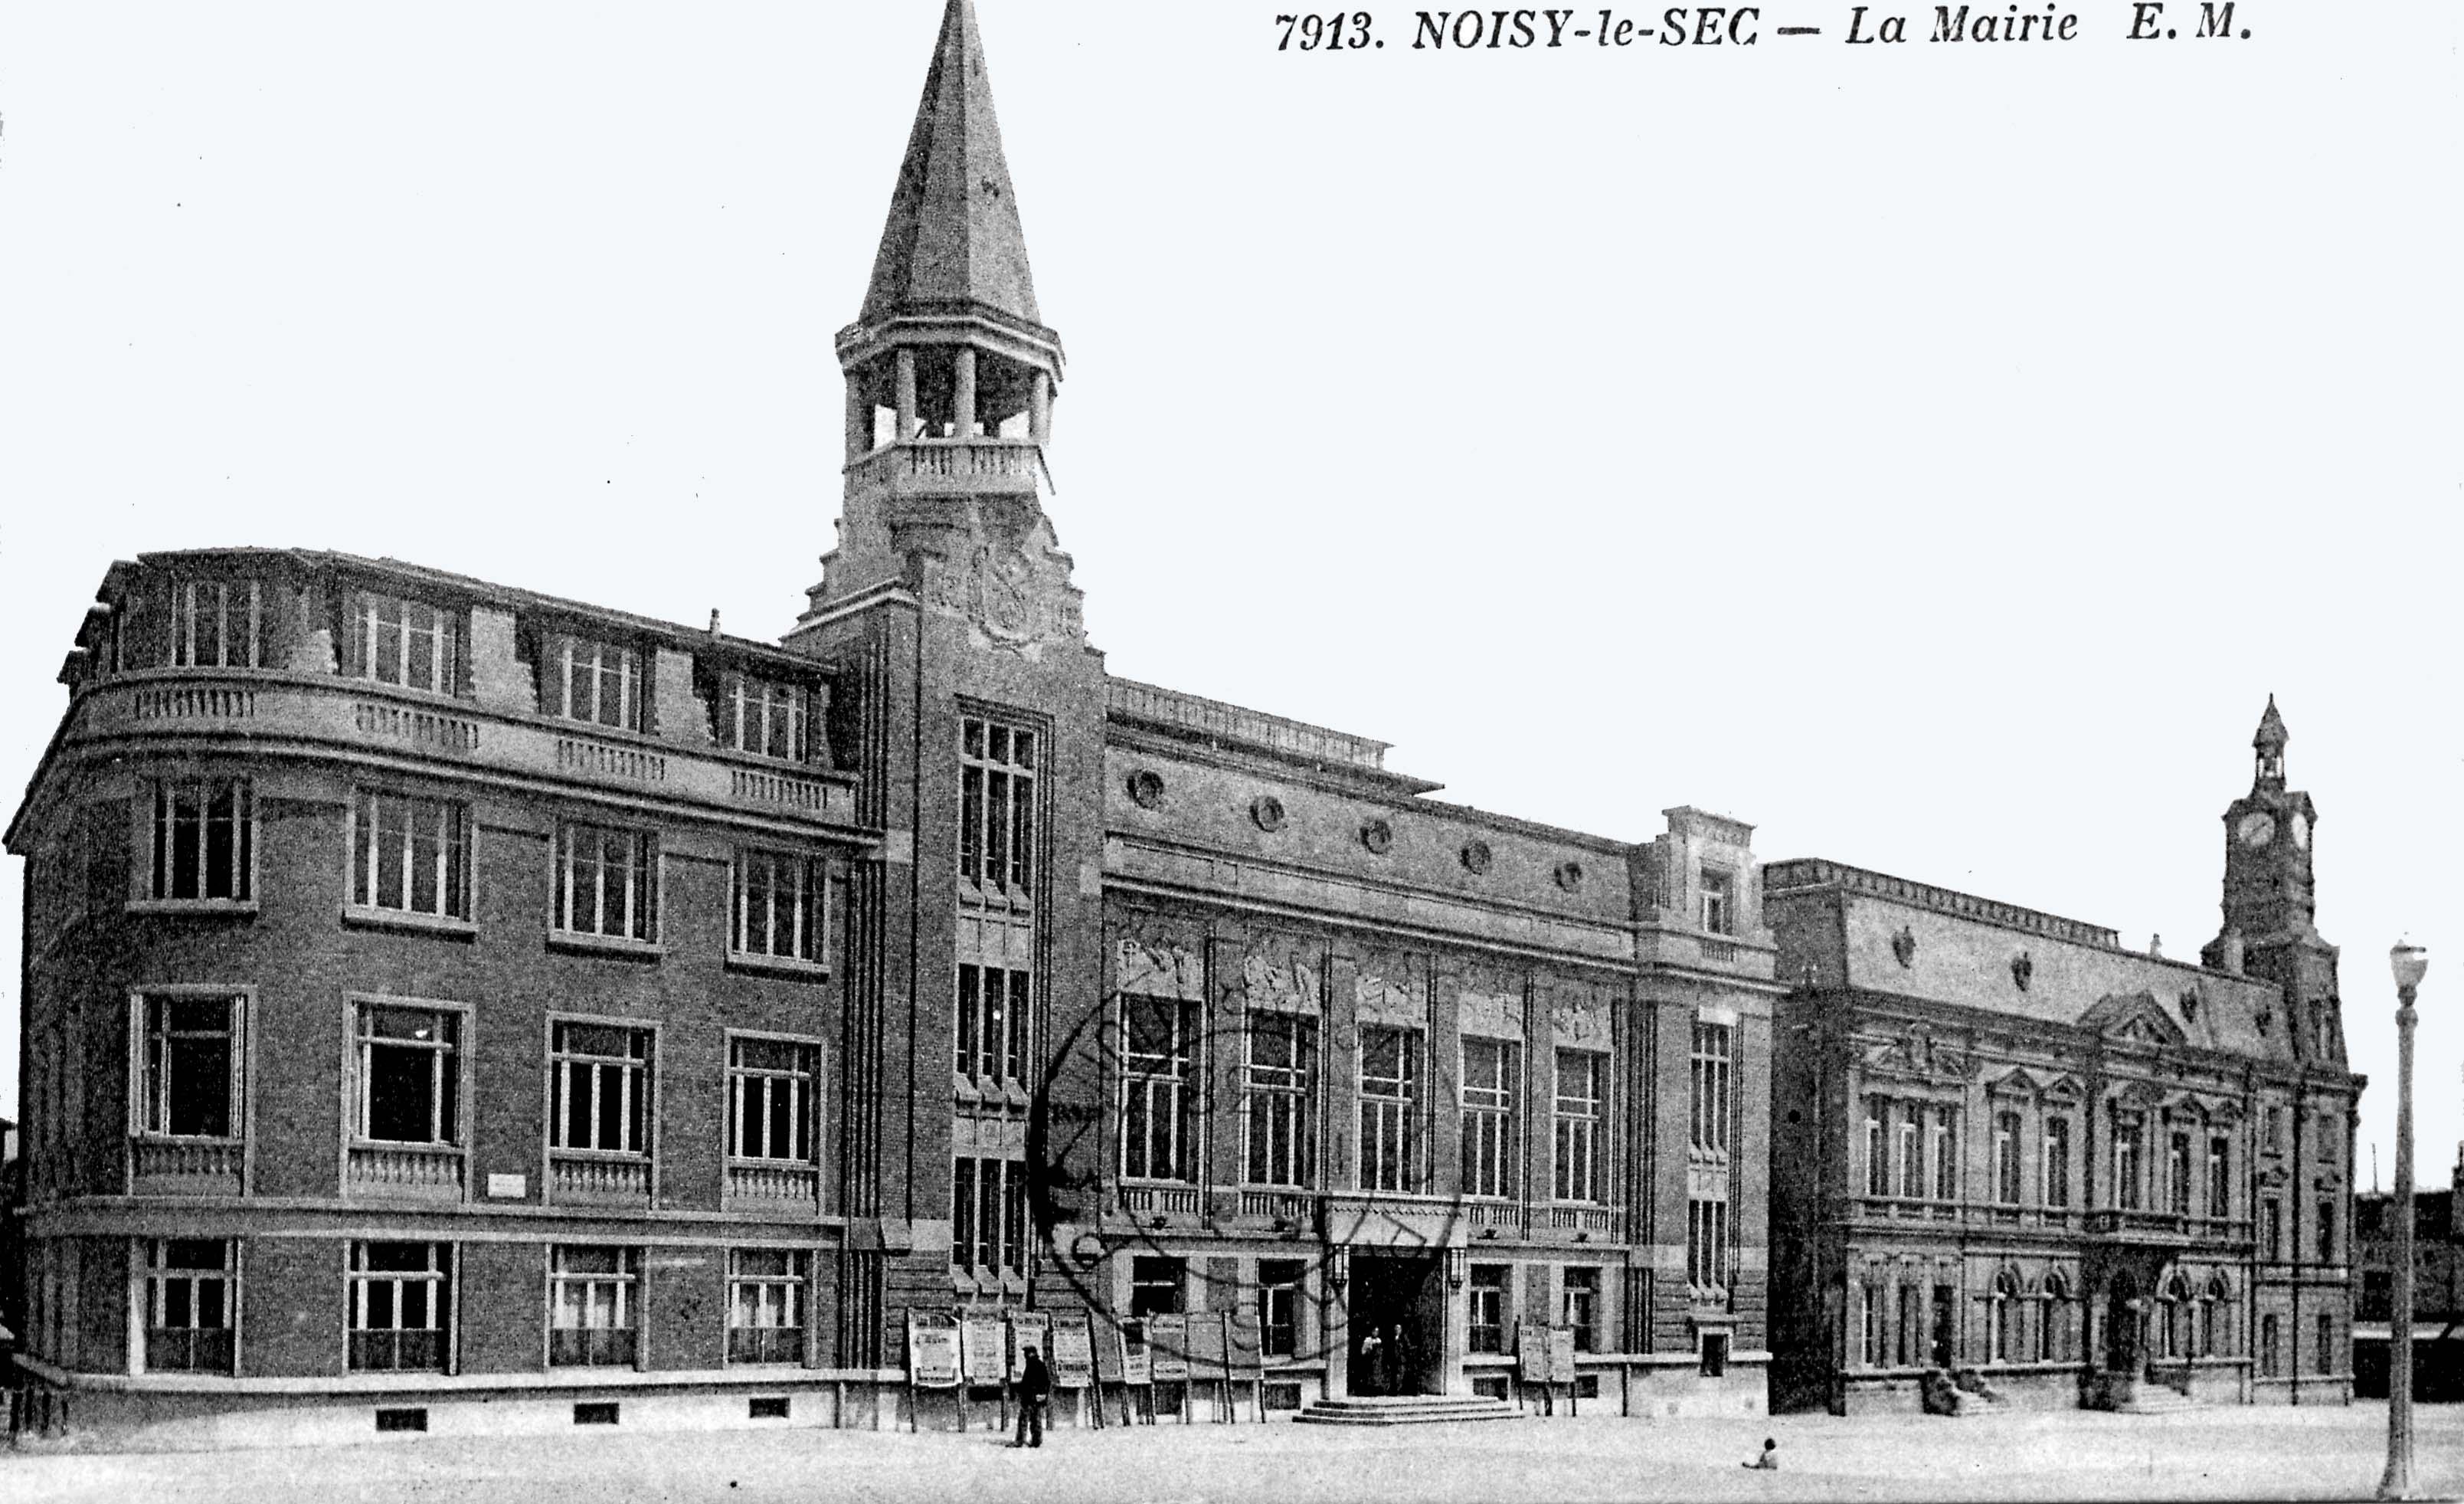 Mairie 1933 noisy le sec histoire - Piscine de noisy le sec ...